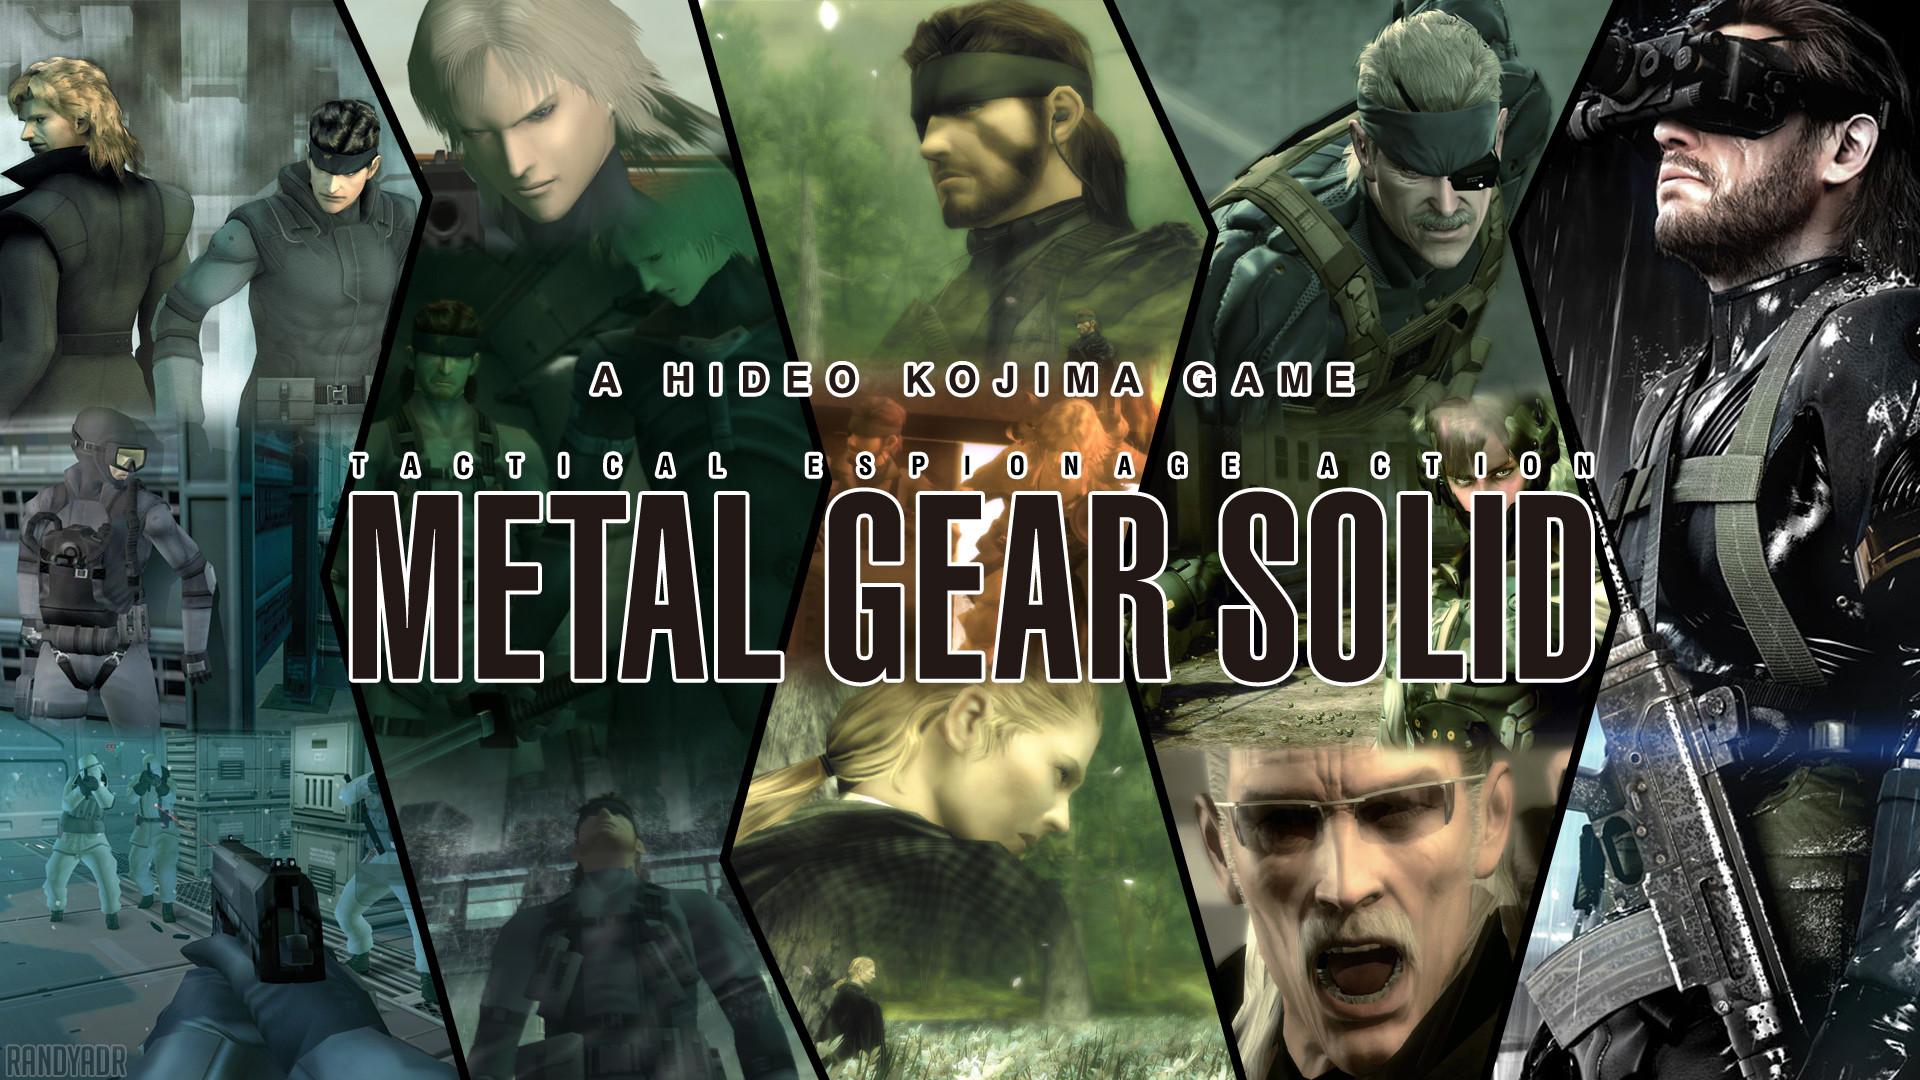 Res: 1920x1080, Metal Gear Solid Wallpaper Attempt by randyadr on deviantART